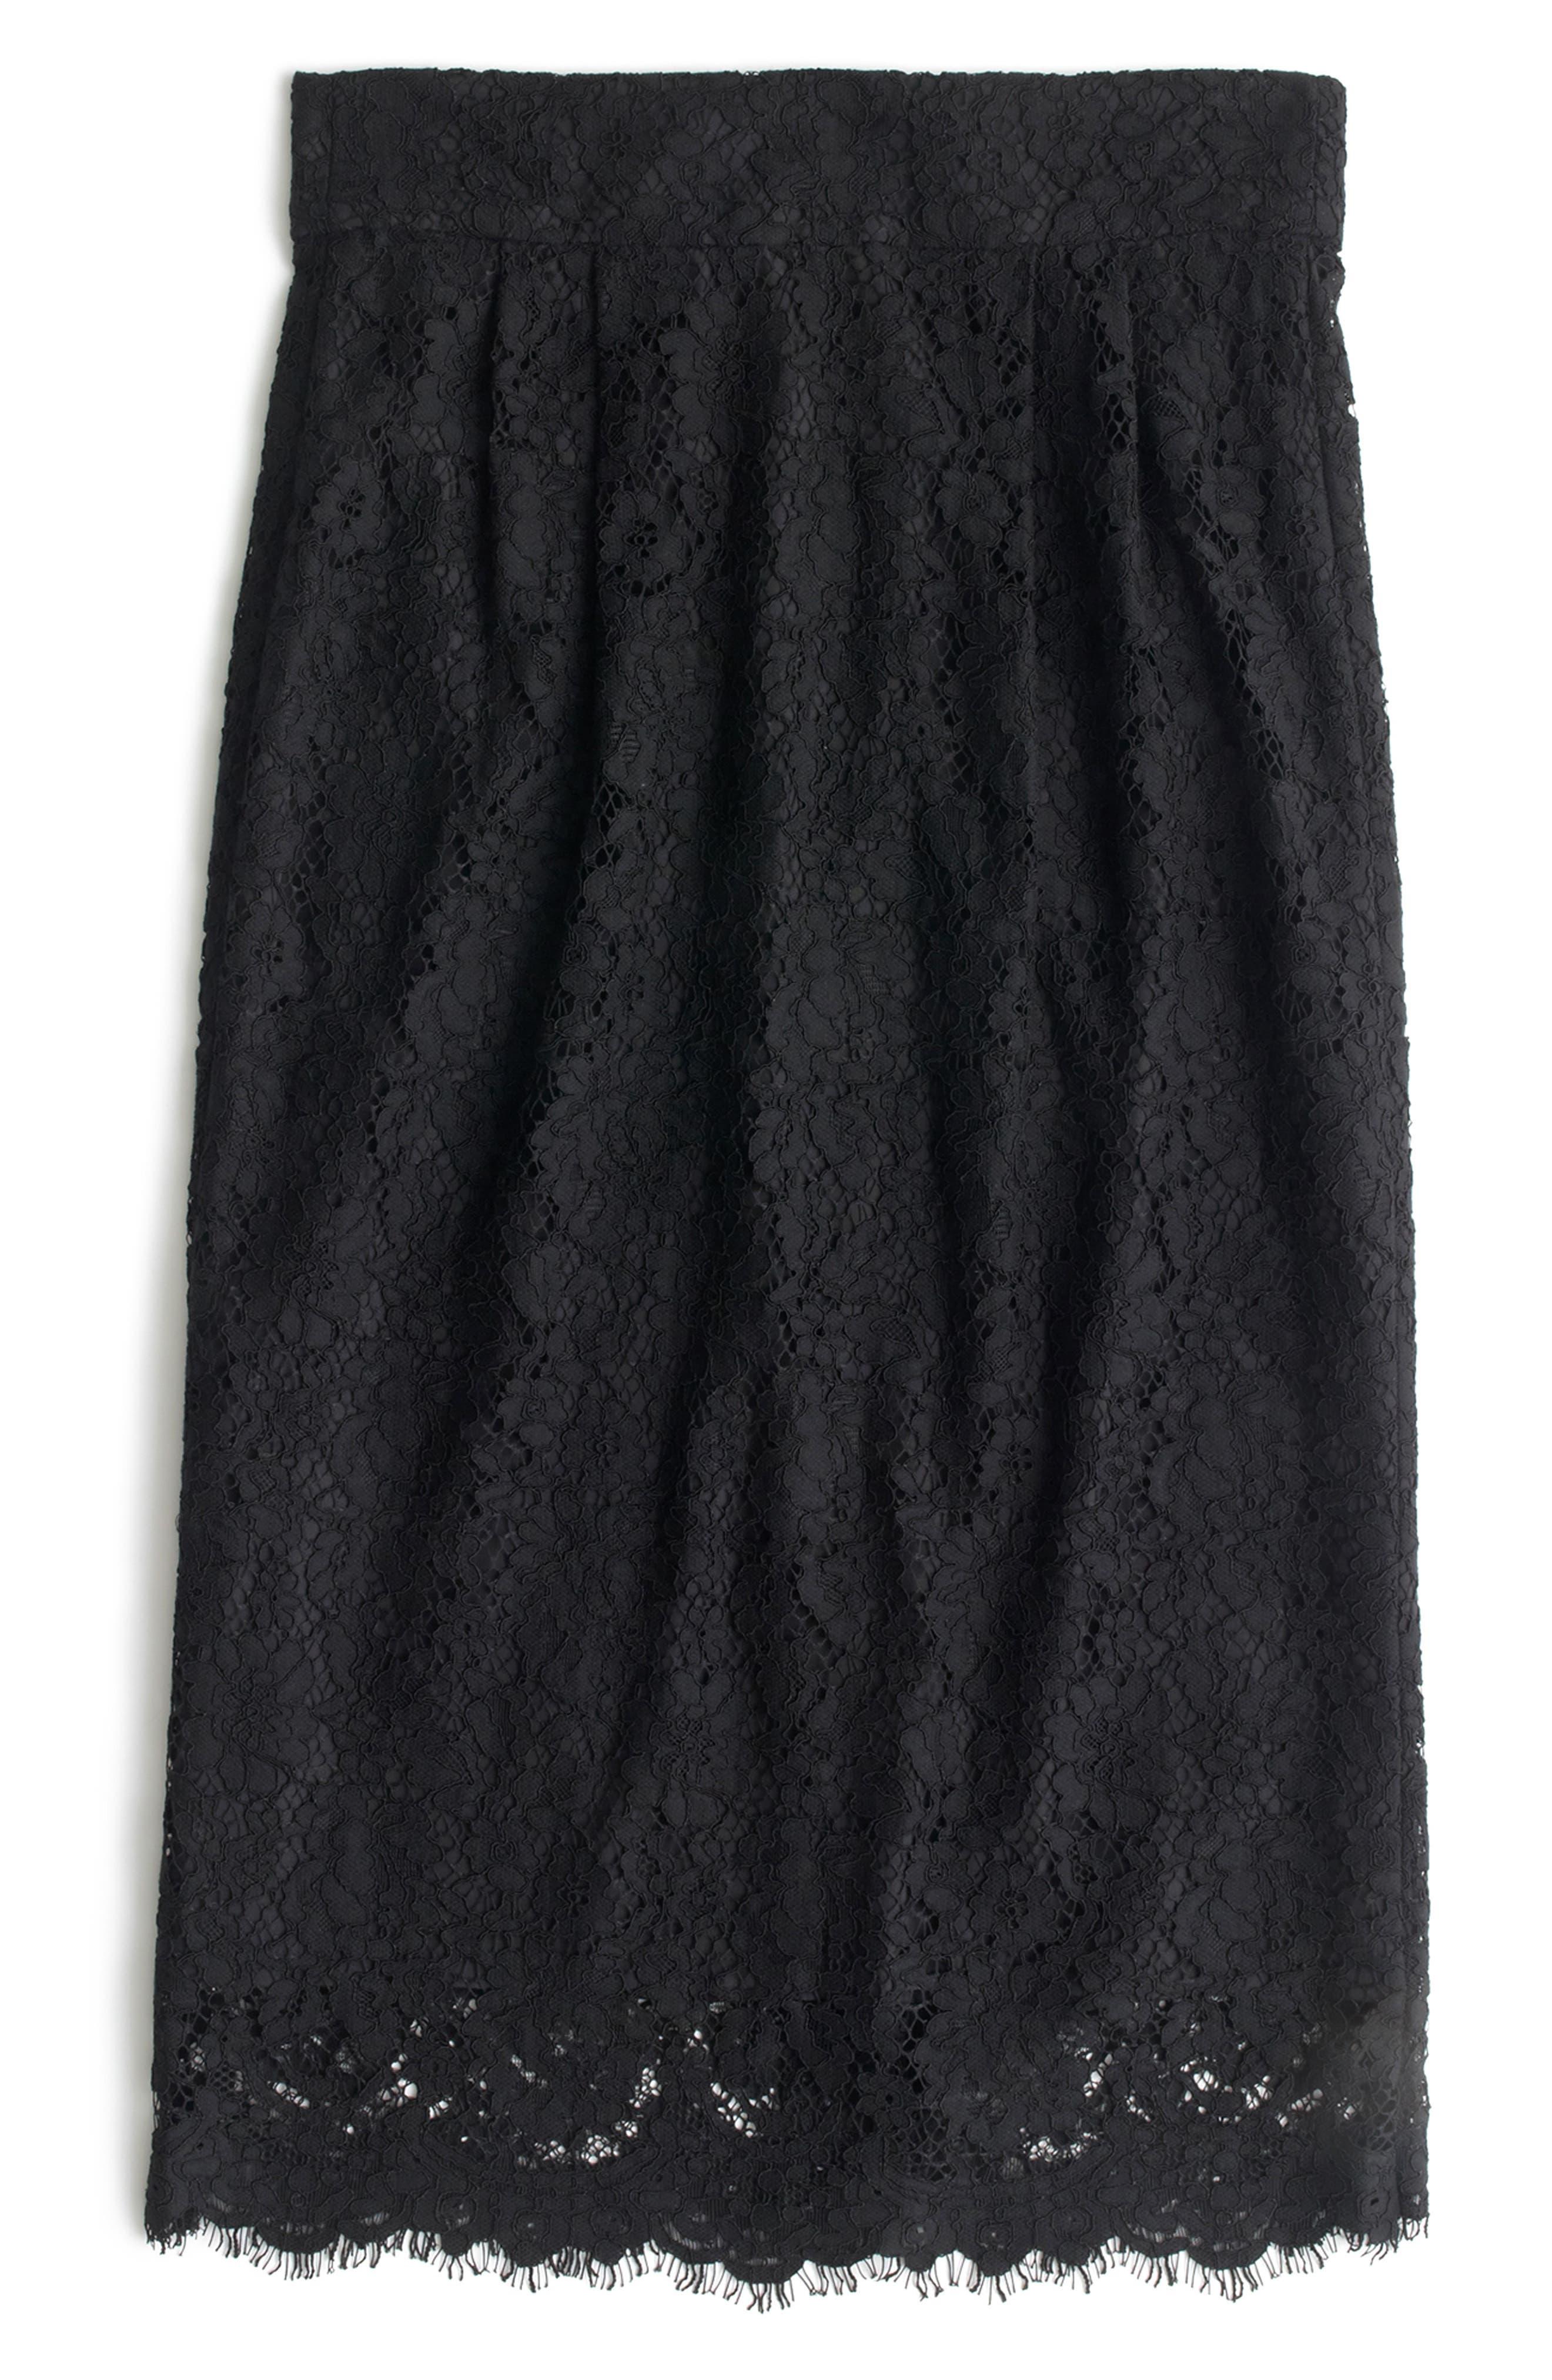 J.crew Lace Pintuck Pencil Skirt, Black